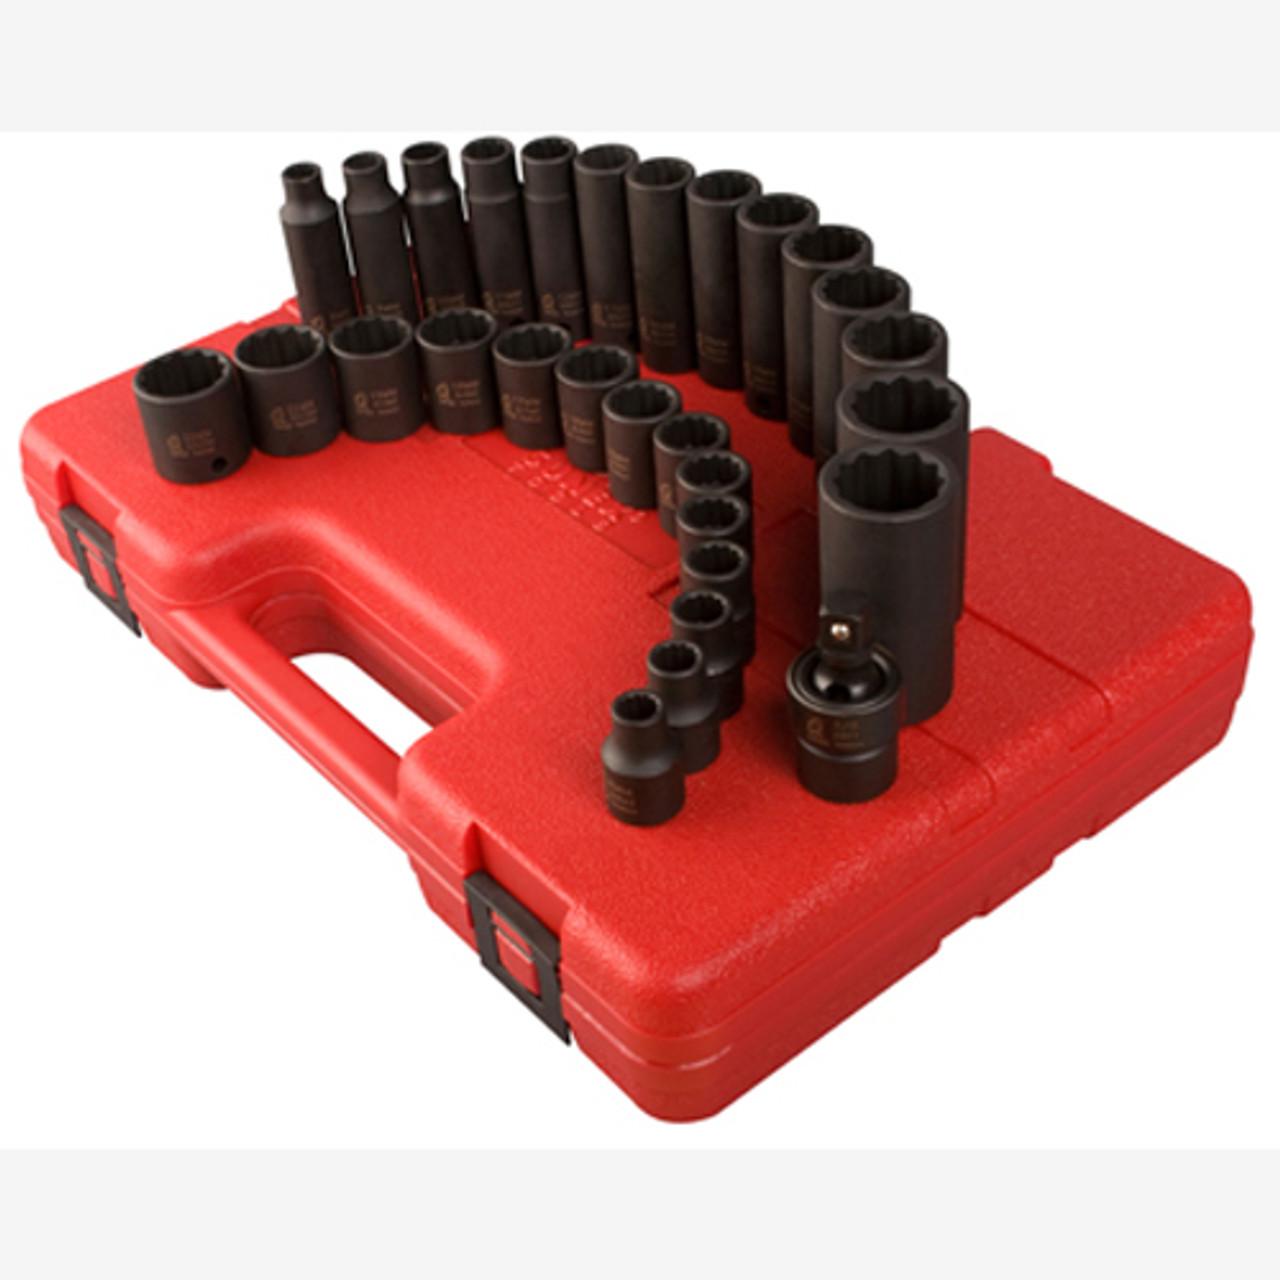 Sunex Tools 2699 1//2 Drive 12 Point Metric Master Impact Socket